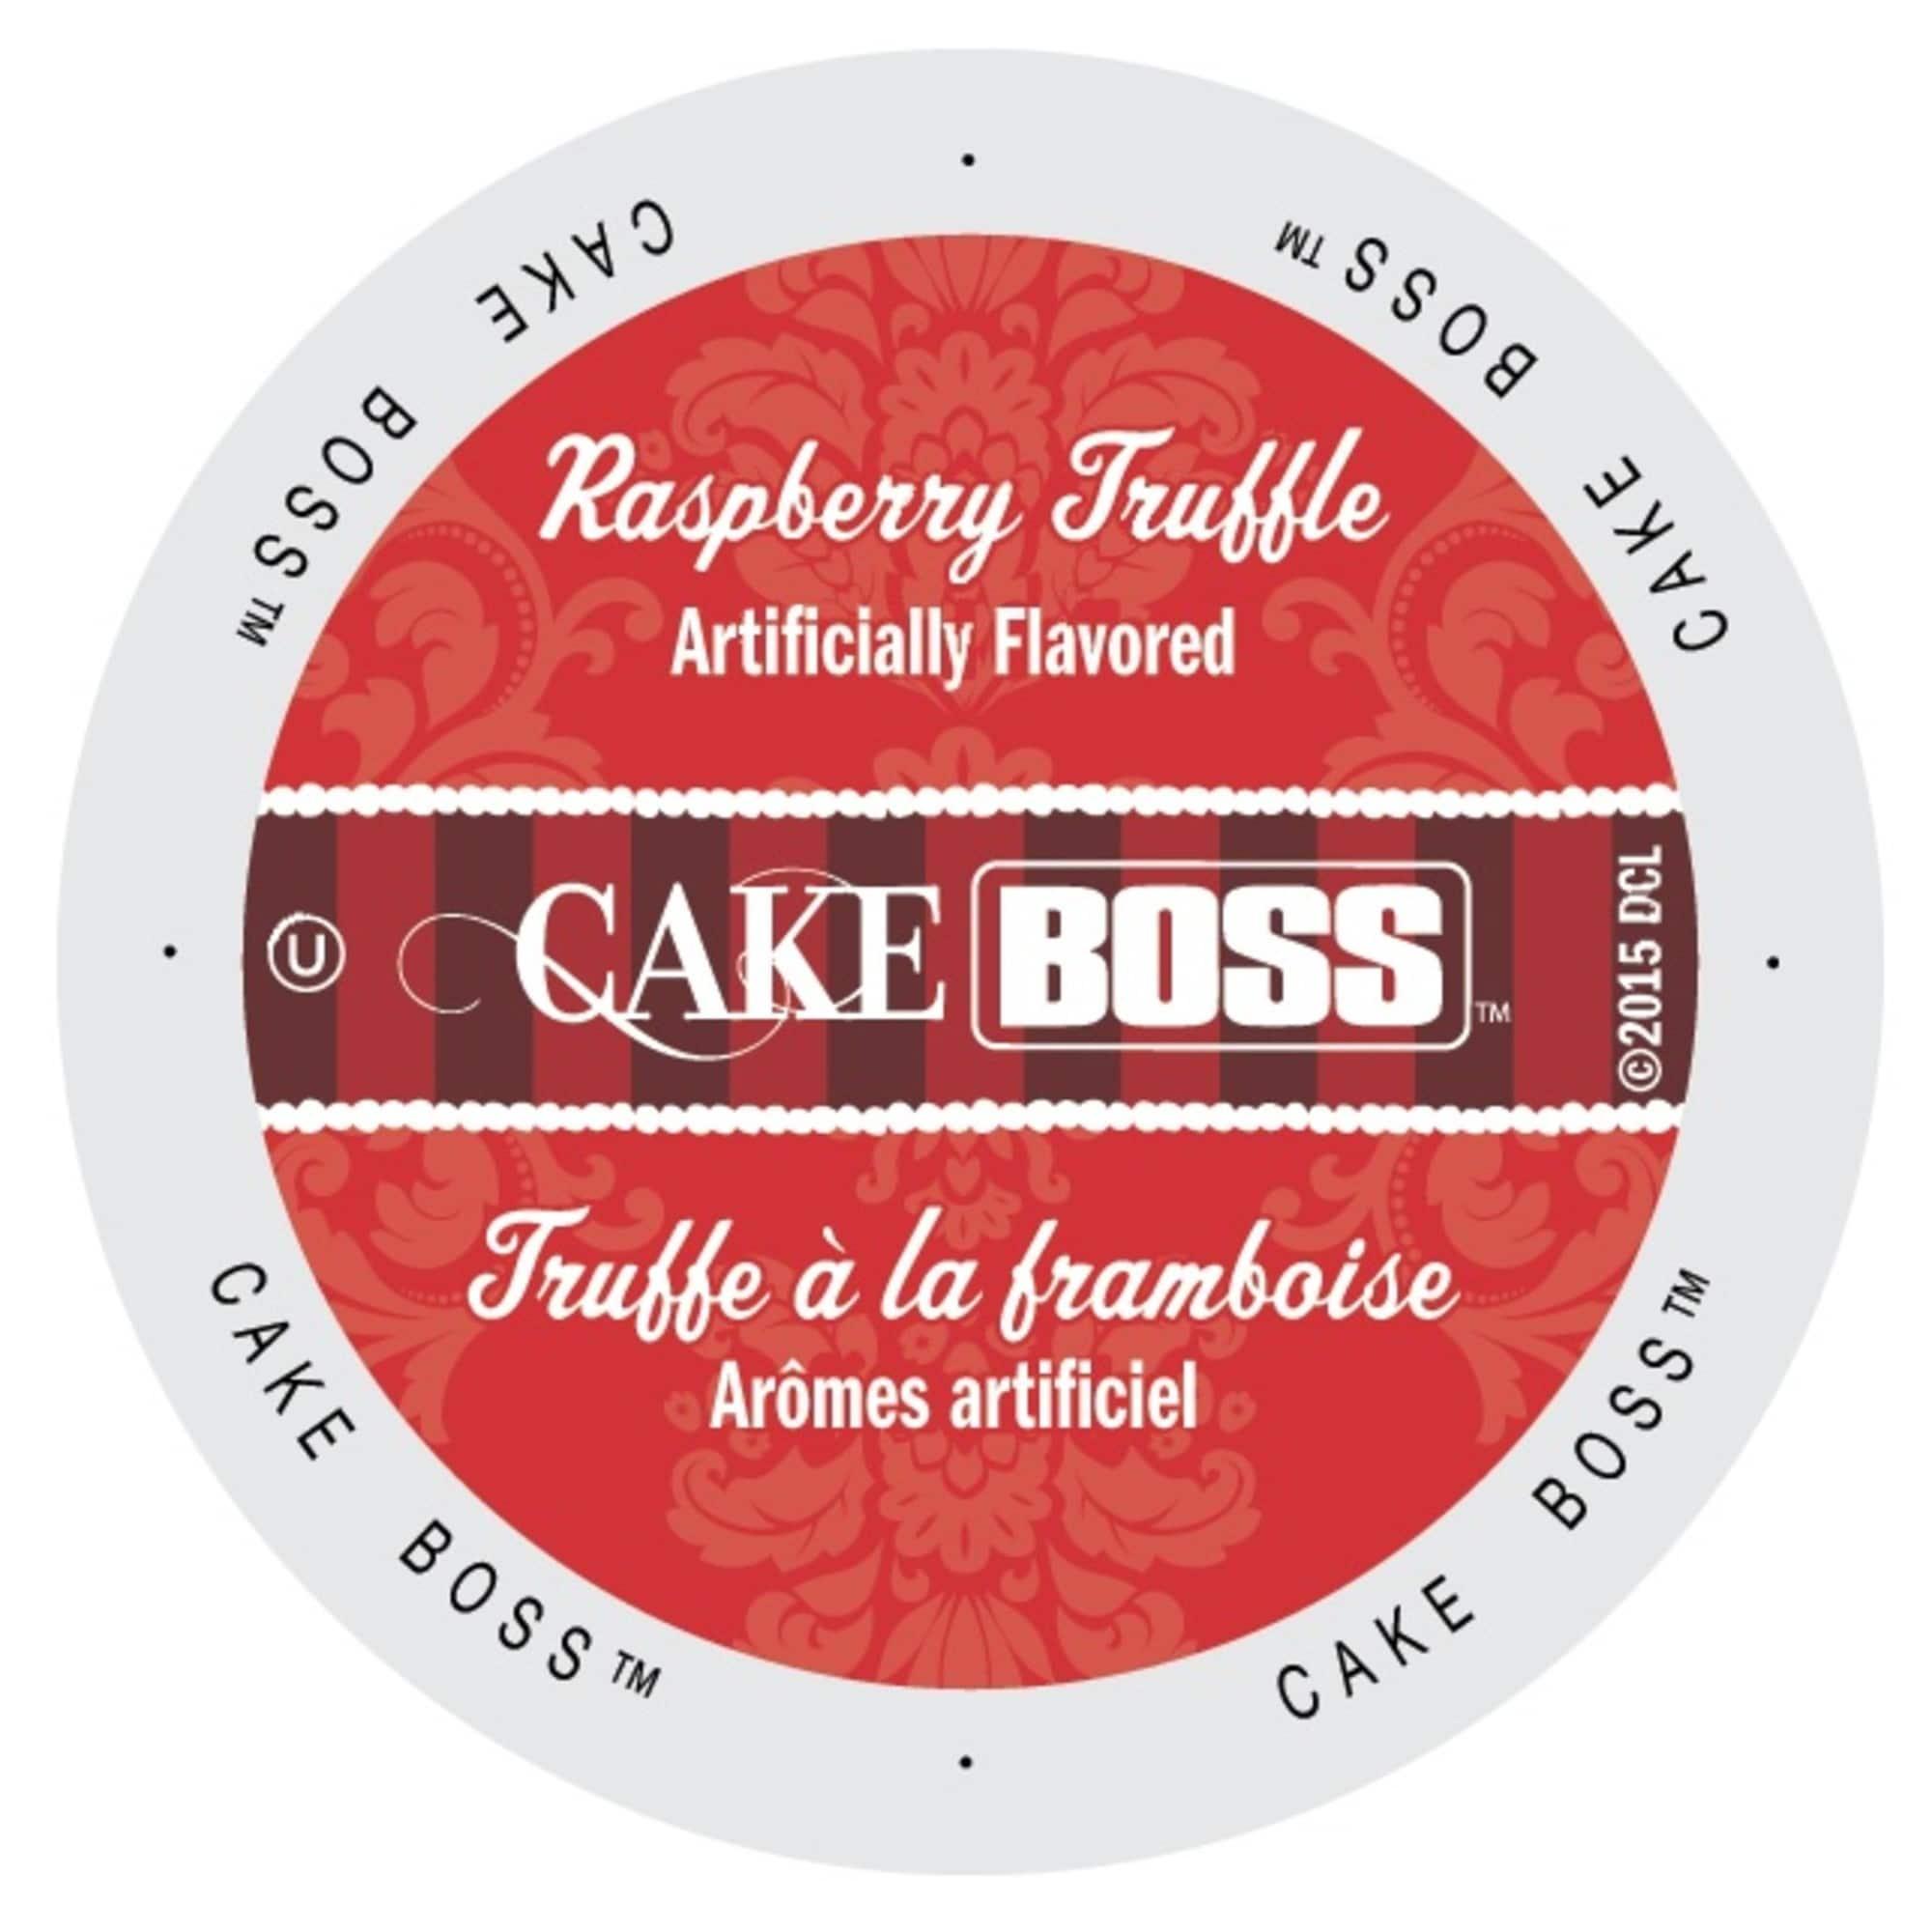 Cake Boss Coffee Raspberry Truffle, Single Serve Cups for...